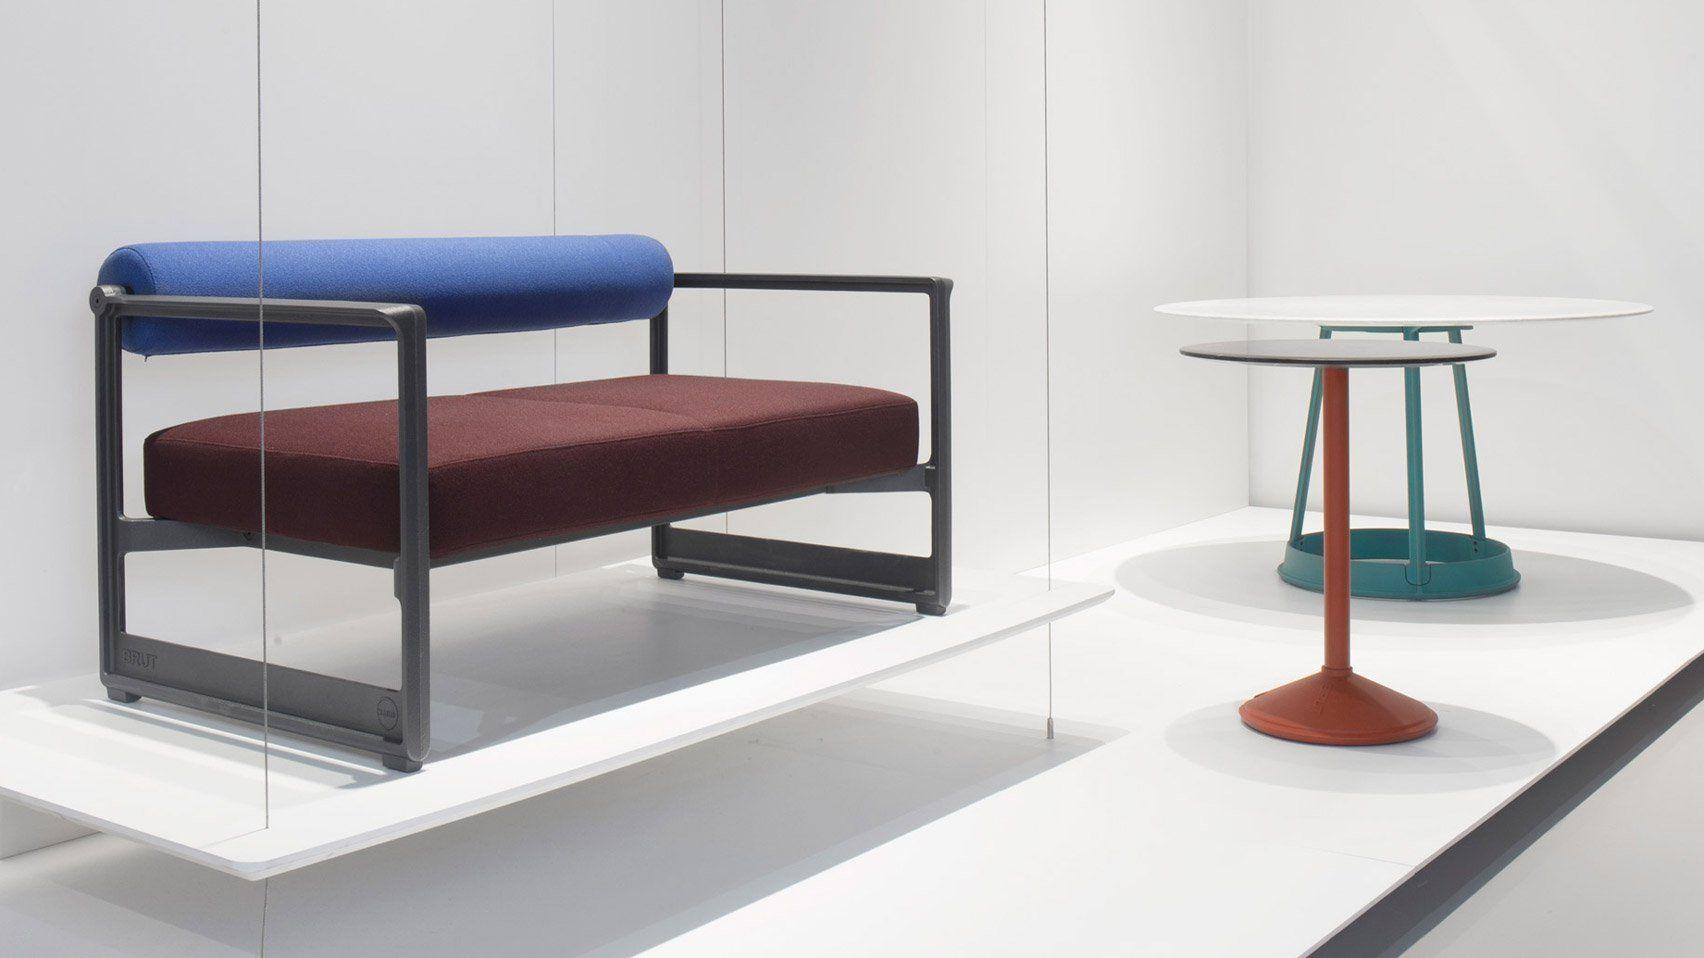 italian furniture brand. German Designer Konstantin Grcic Has Created A Sofa With Machinery-inspired Cast-iron Elements Italian Furniture Brand